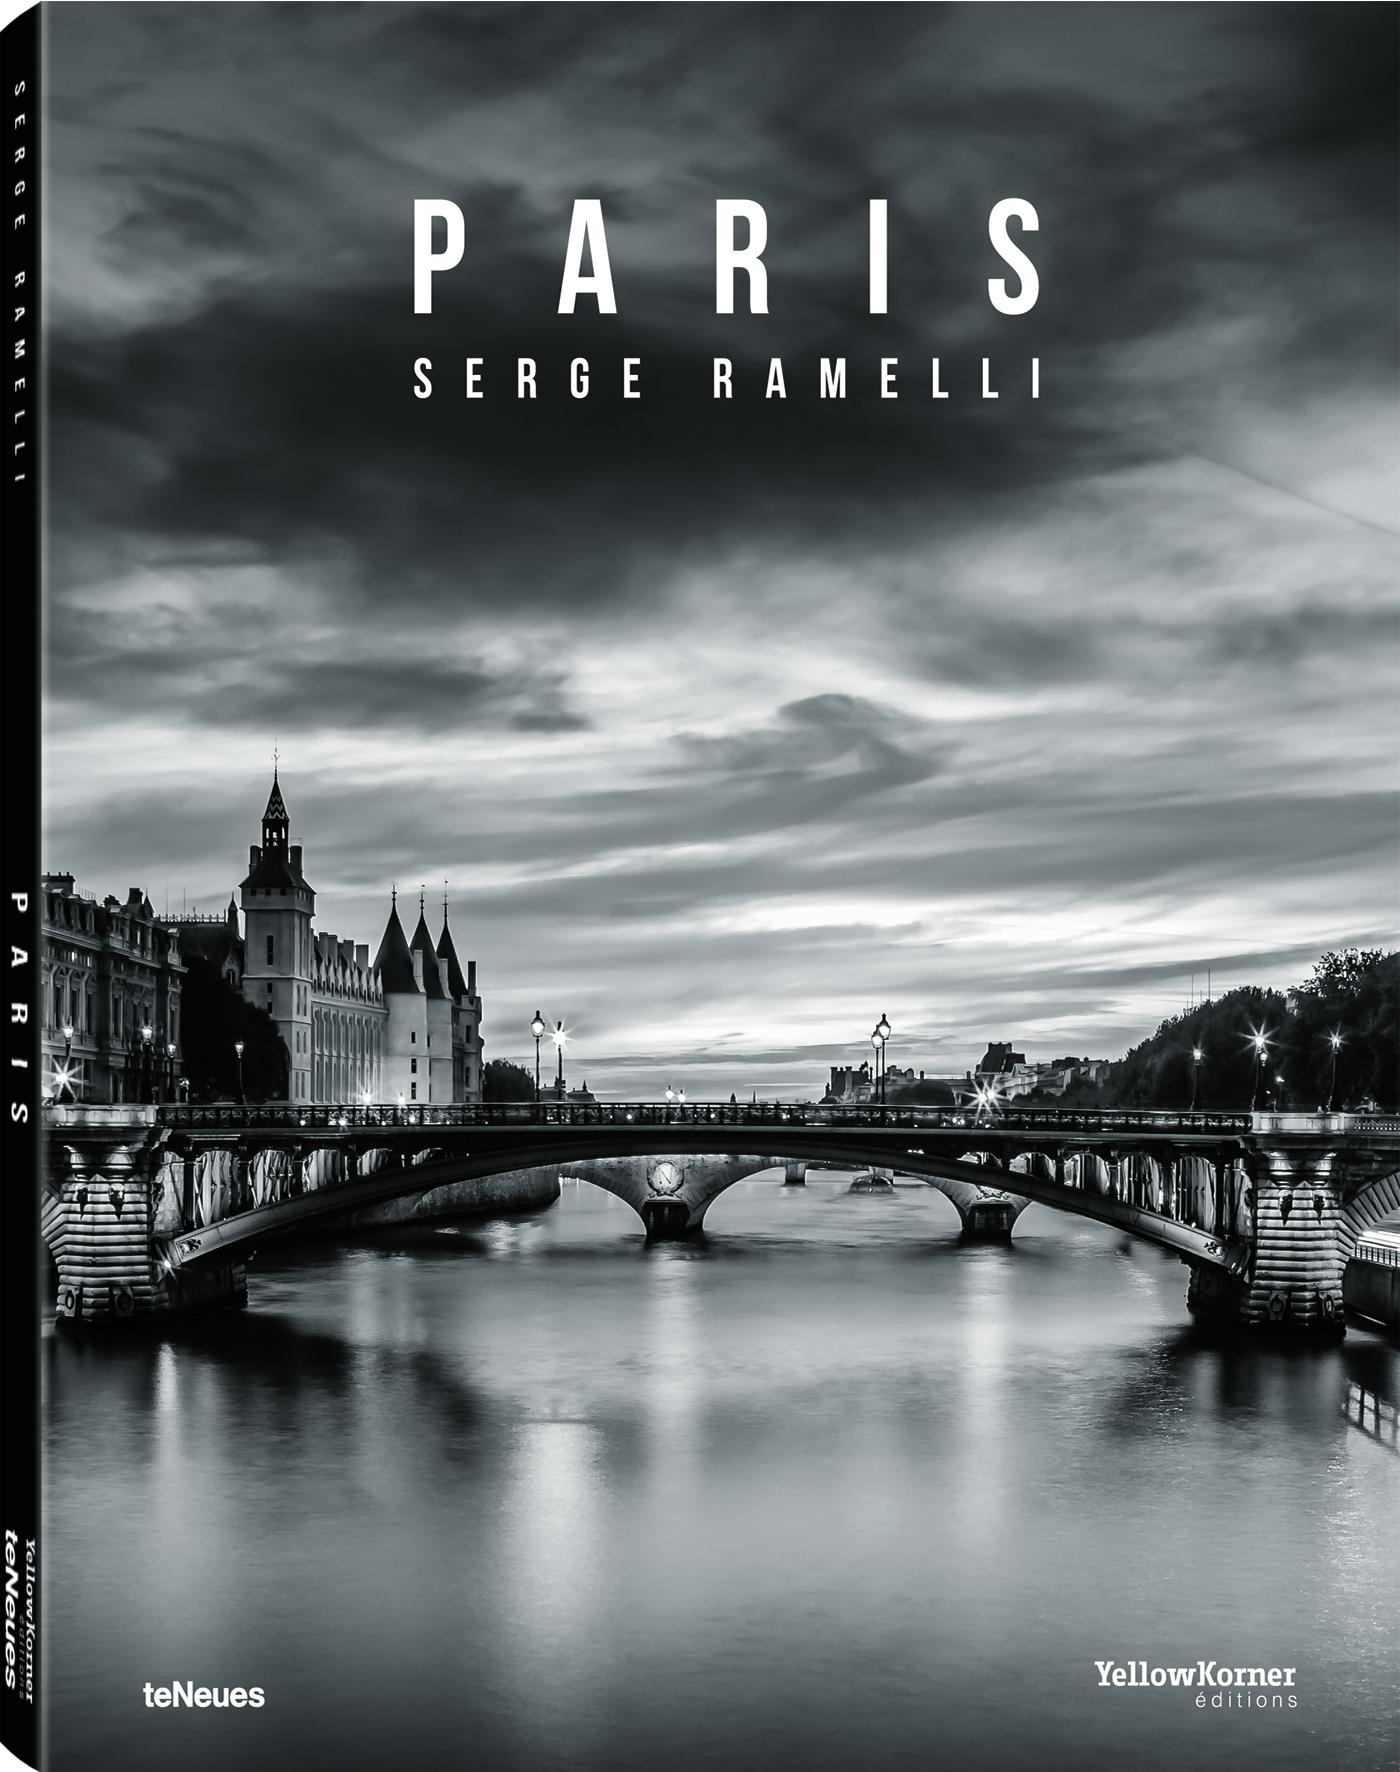 PARIS, FLEXICOVER EDITION